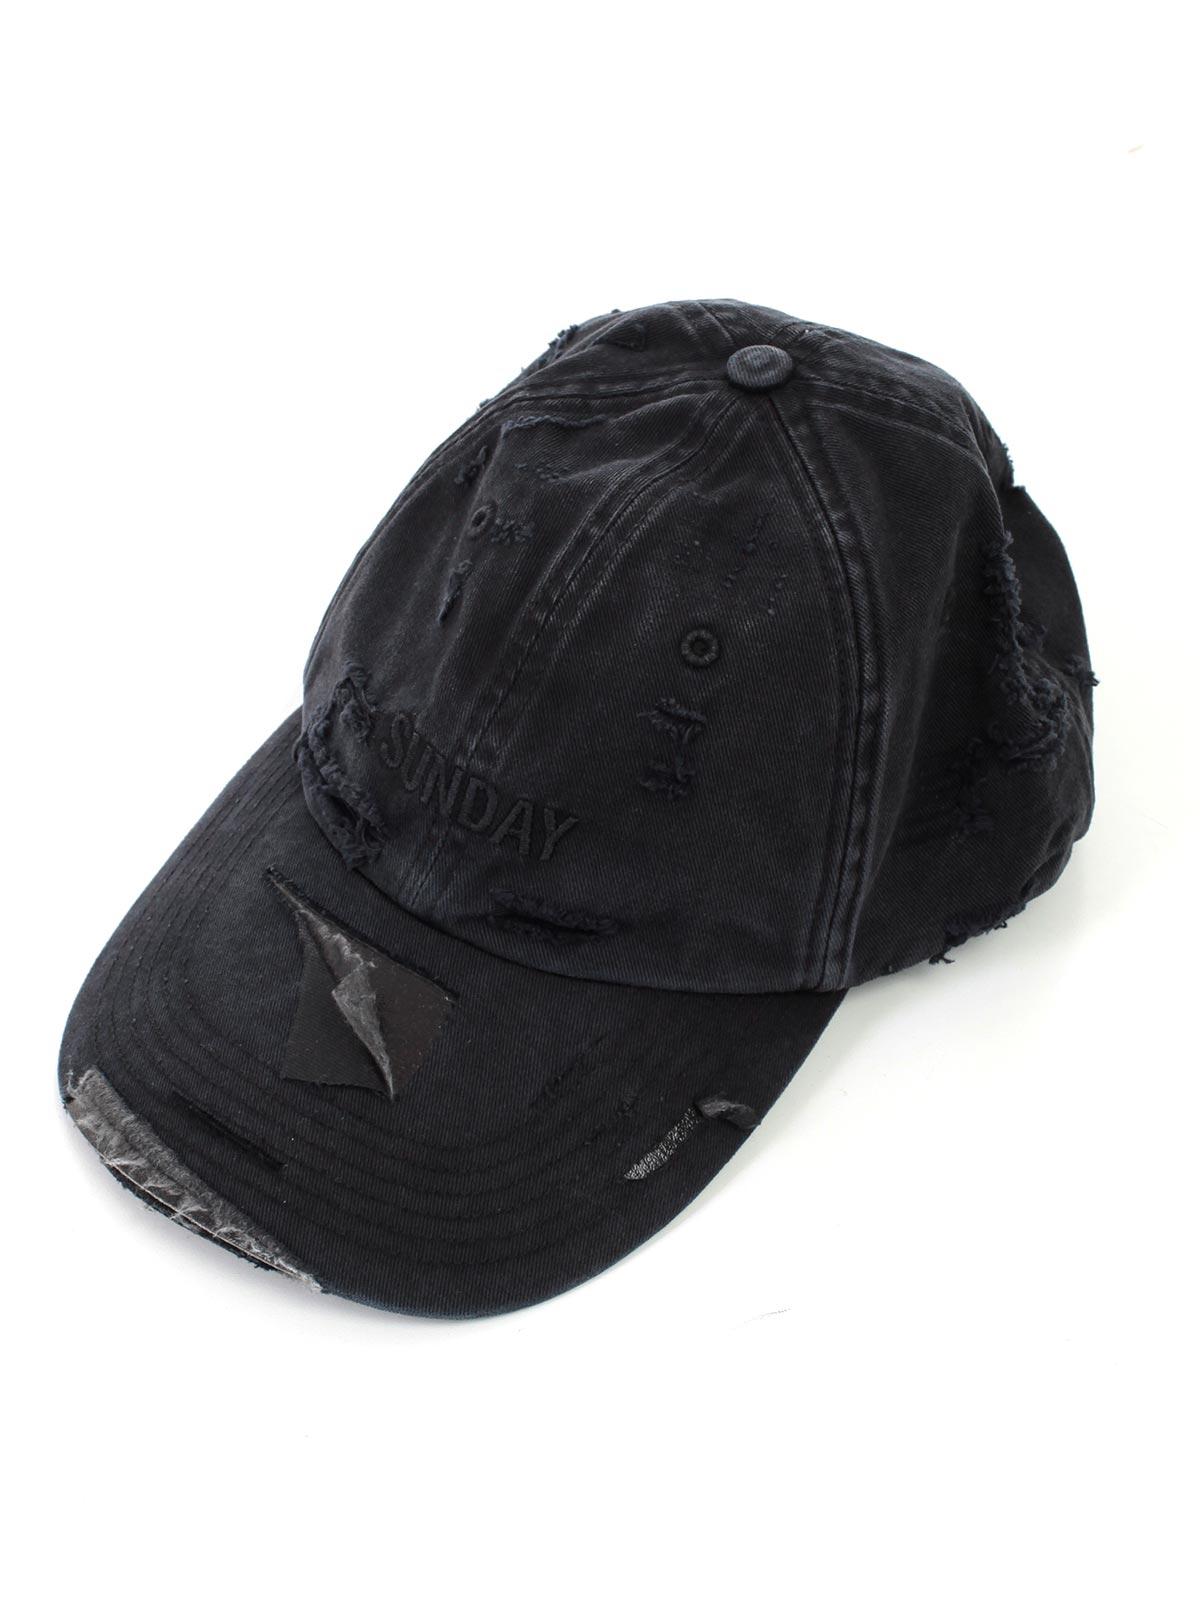 Vetements Hat USS198026 - SUNDAY.Bernardelli Store - Online fashion ... 2efd13ffe49